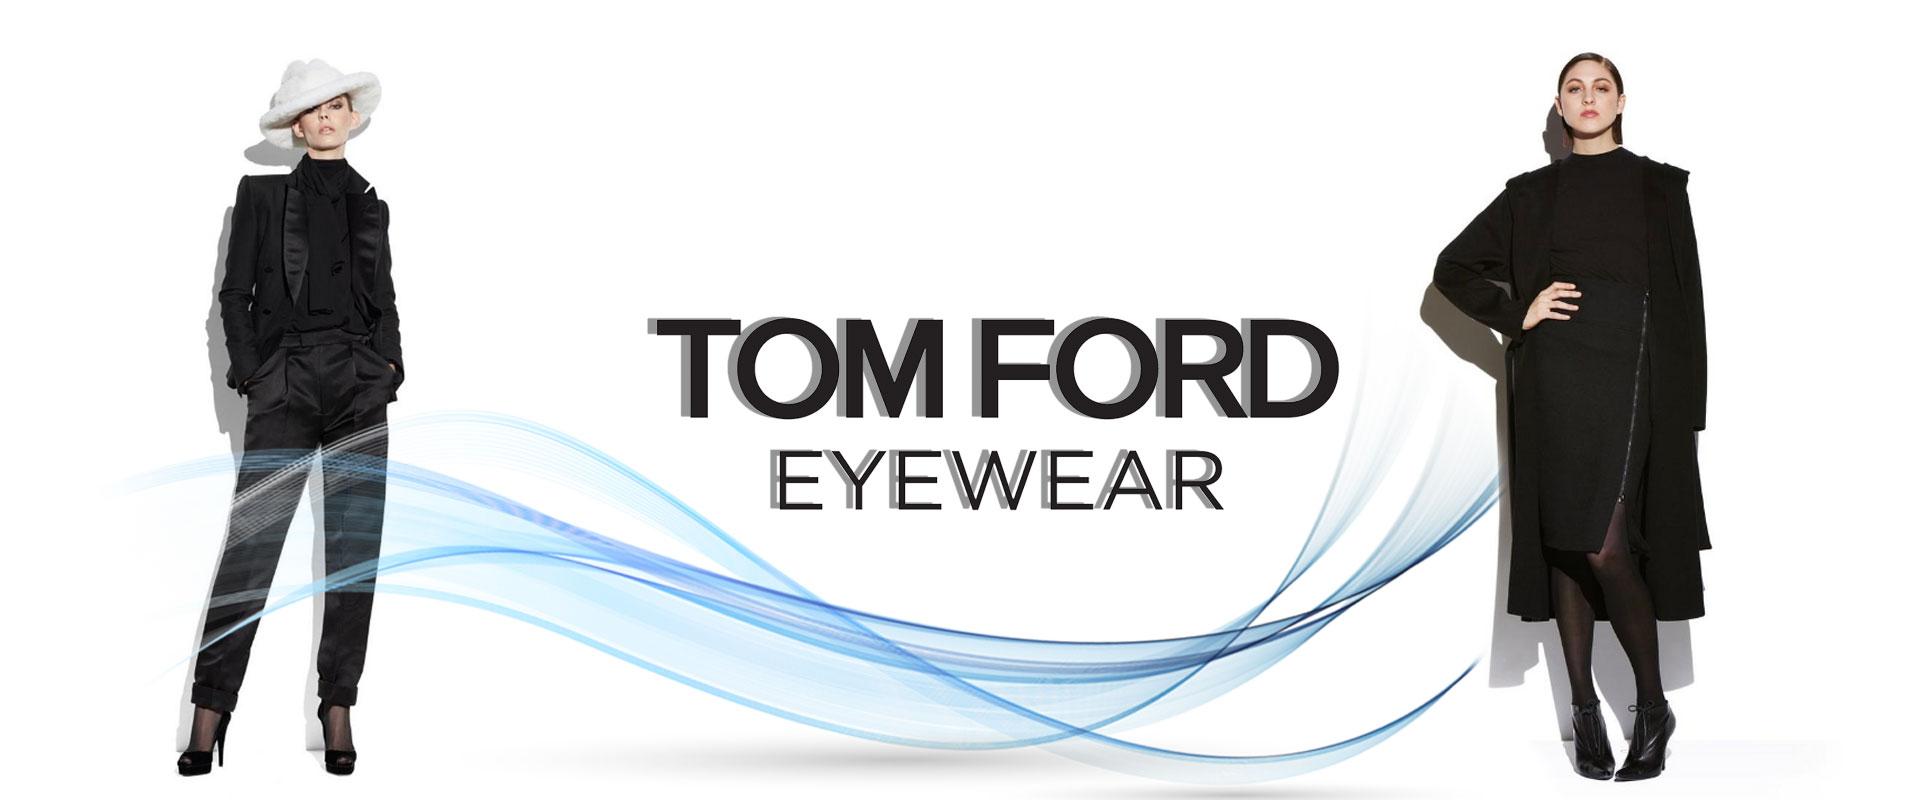 TomFord 3 9 - تام فورد Tom Ford